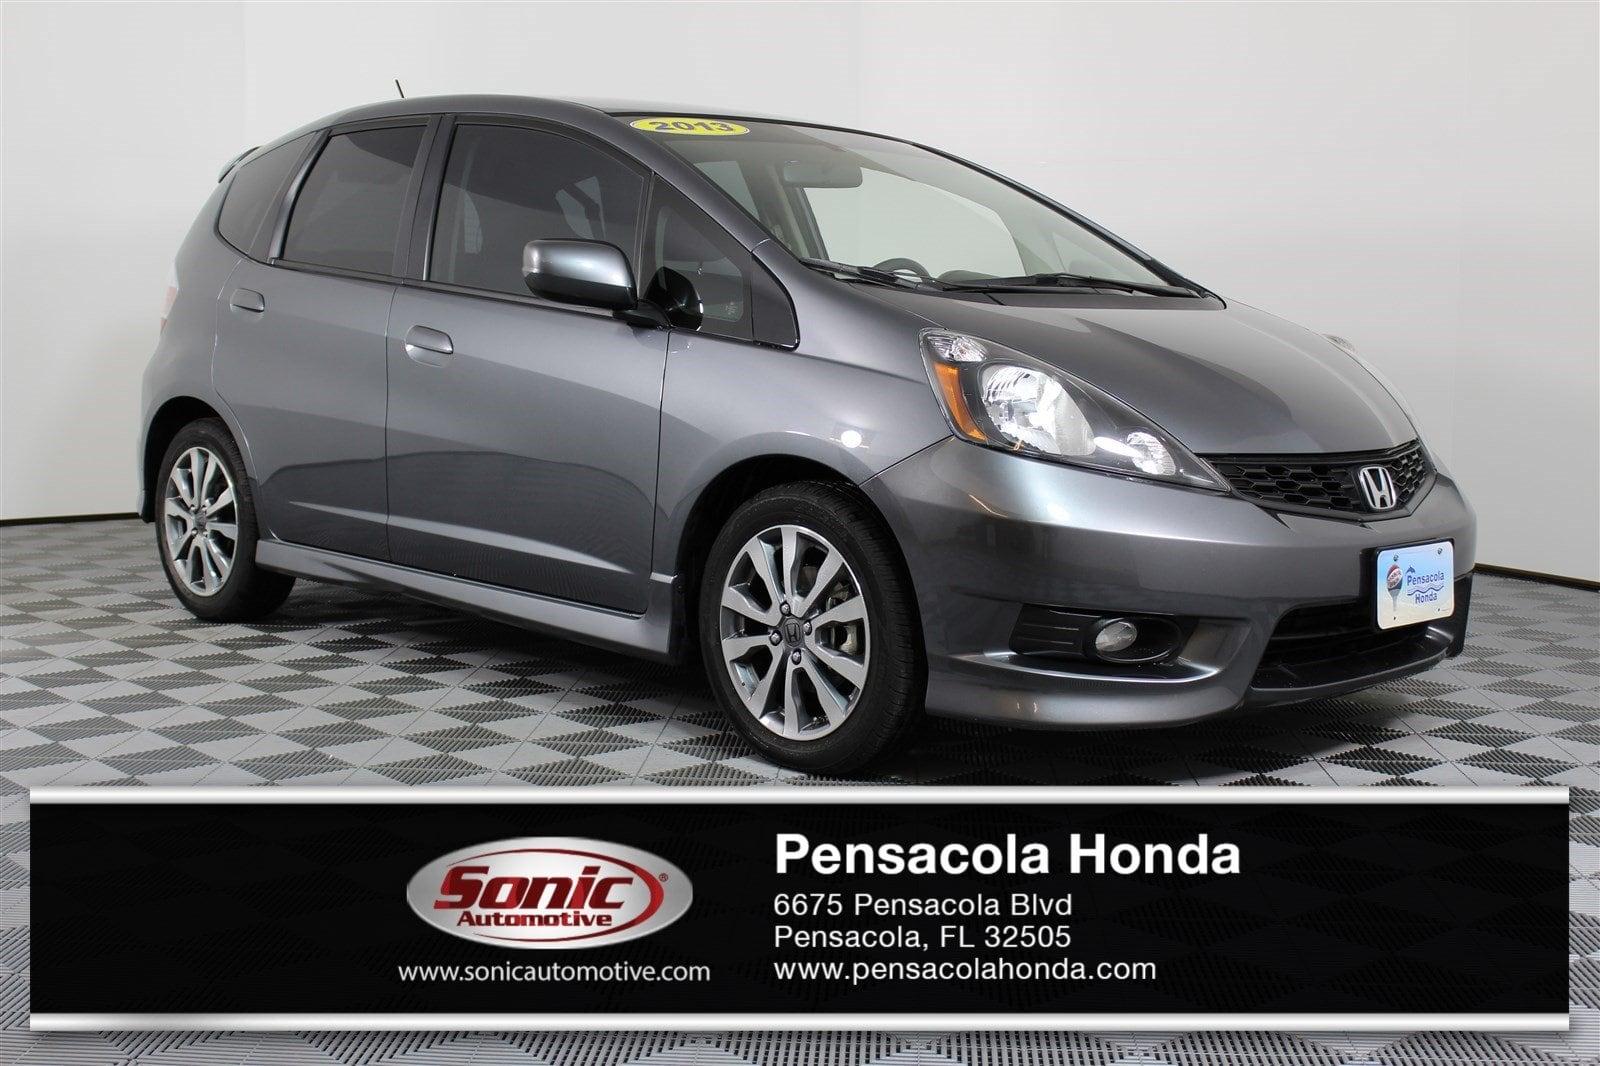 Photo 2013 Honda Fit Sport 5dr HB Auto in Pensacola